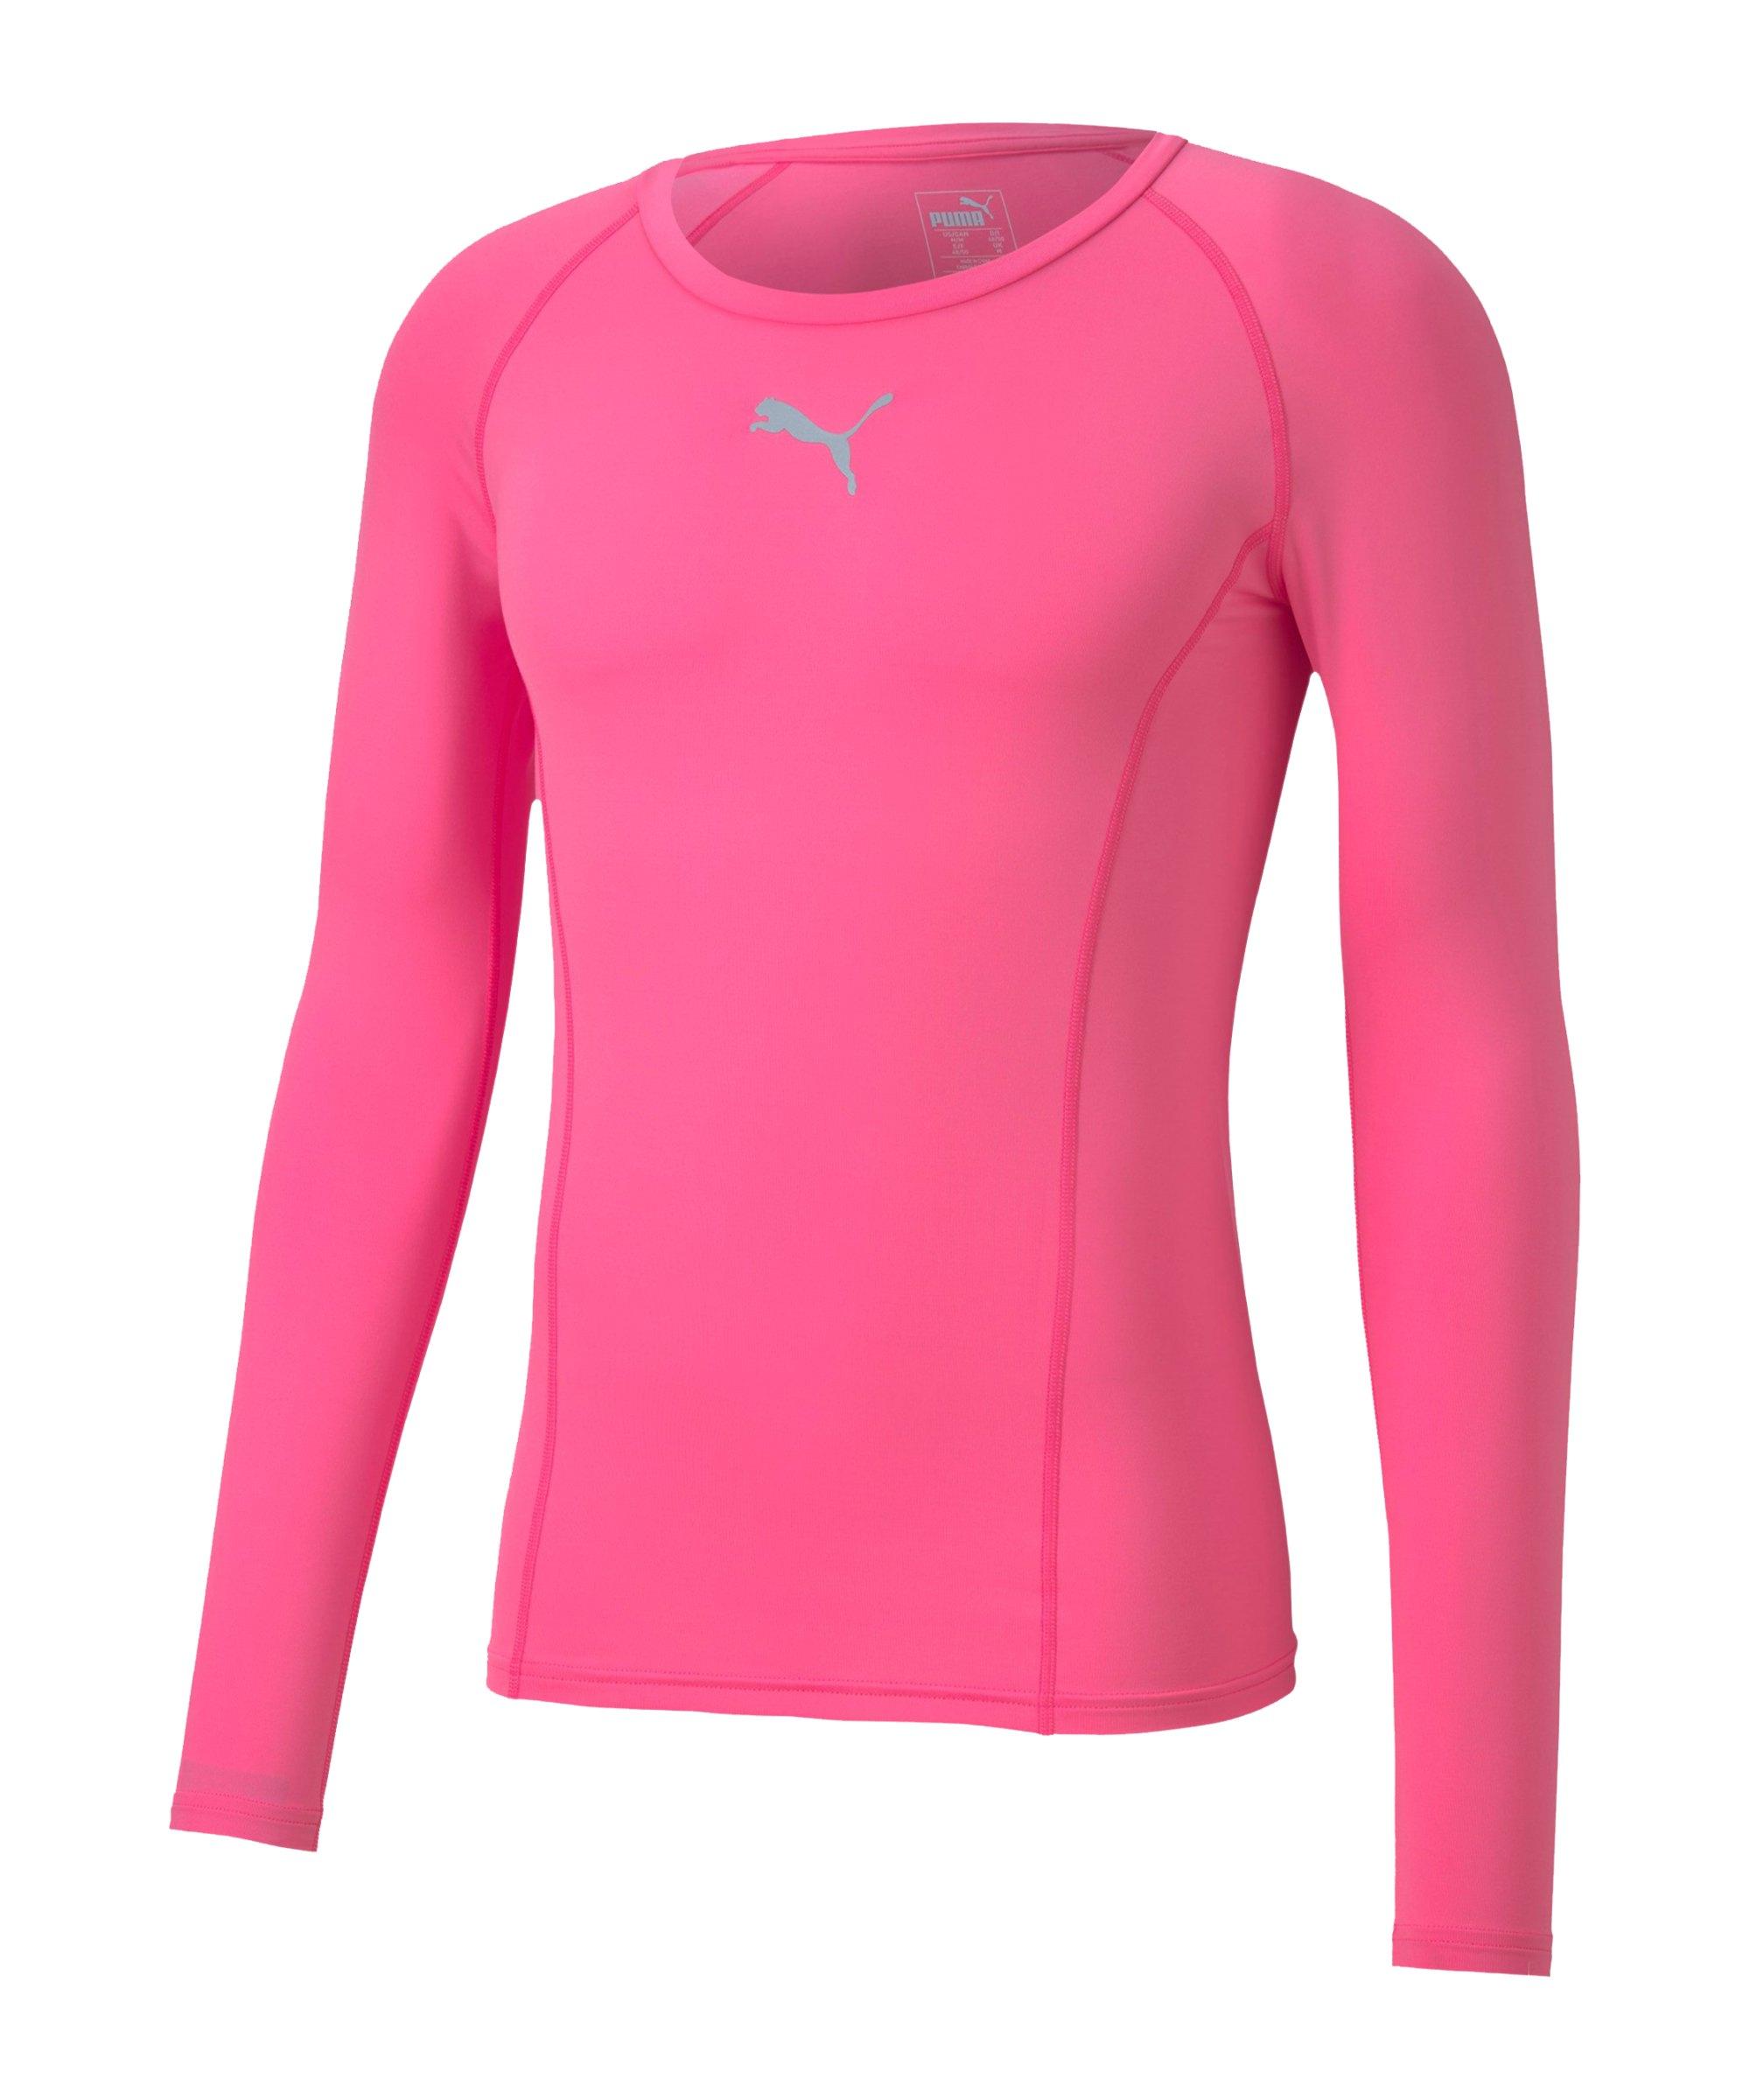 PUMA LIGA Baselayer Longsleeve Pink F29 - pink